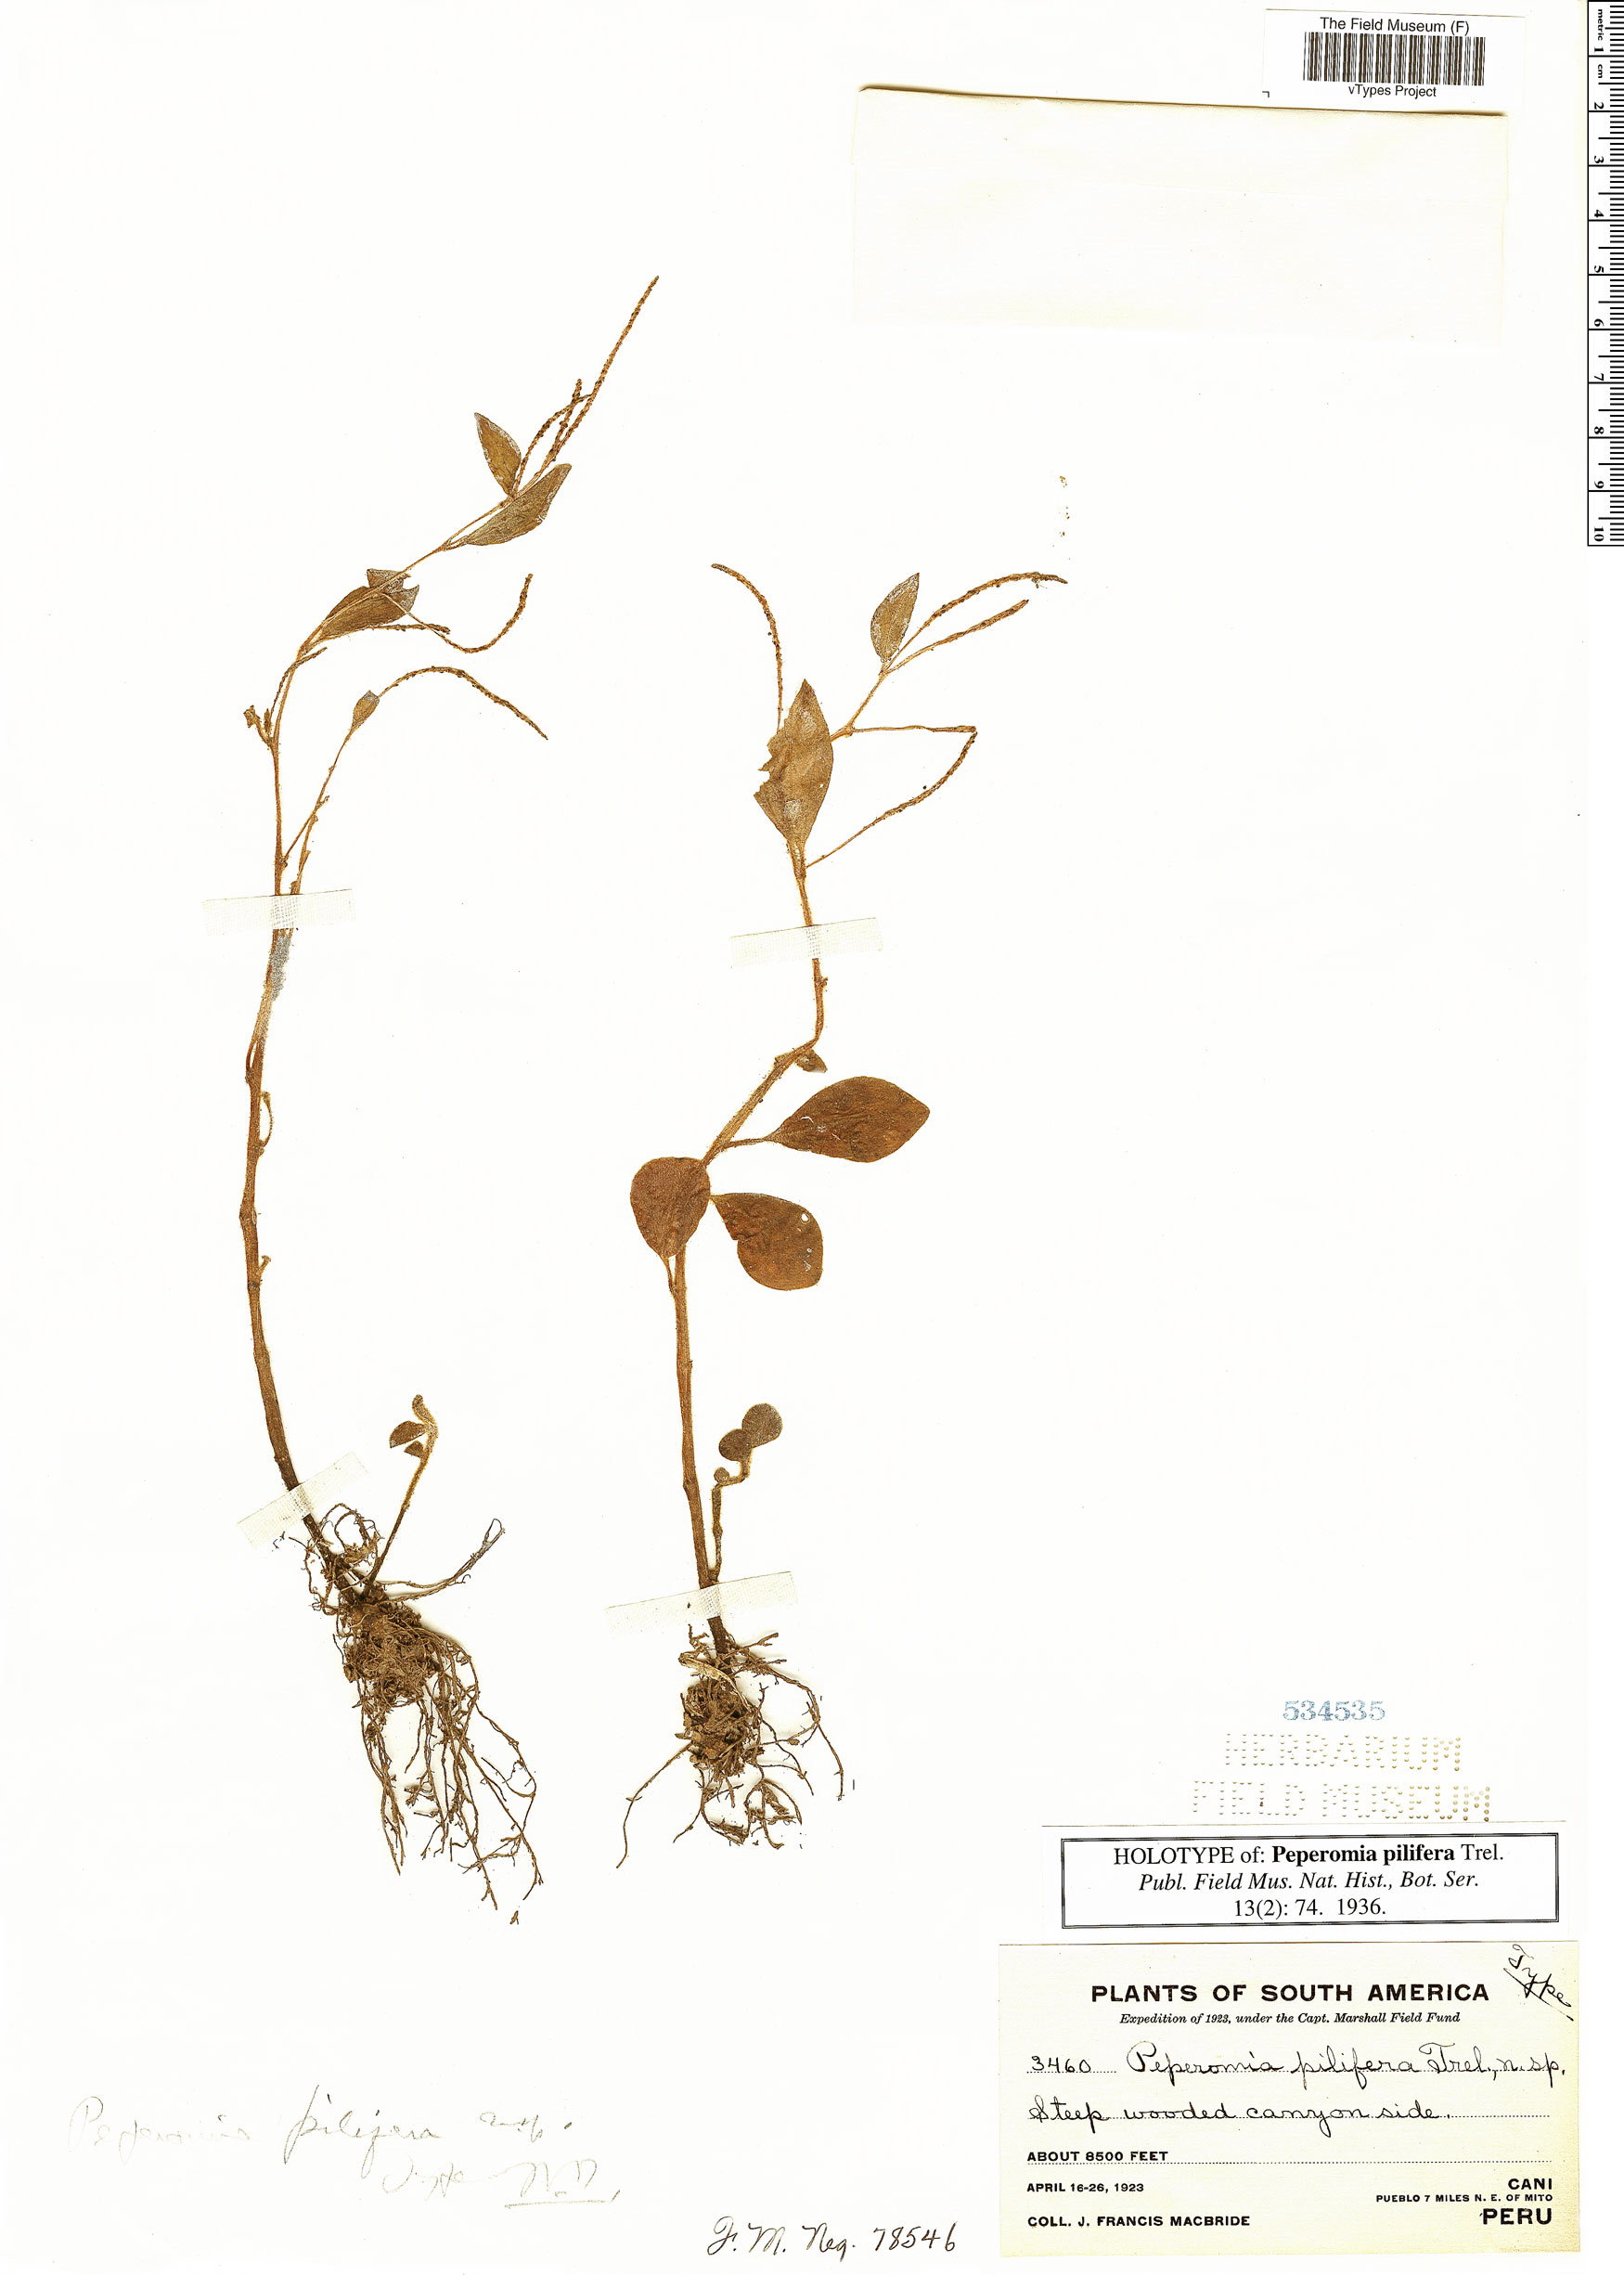 Specimen: Peperomia pilifera